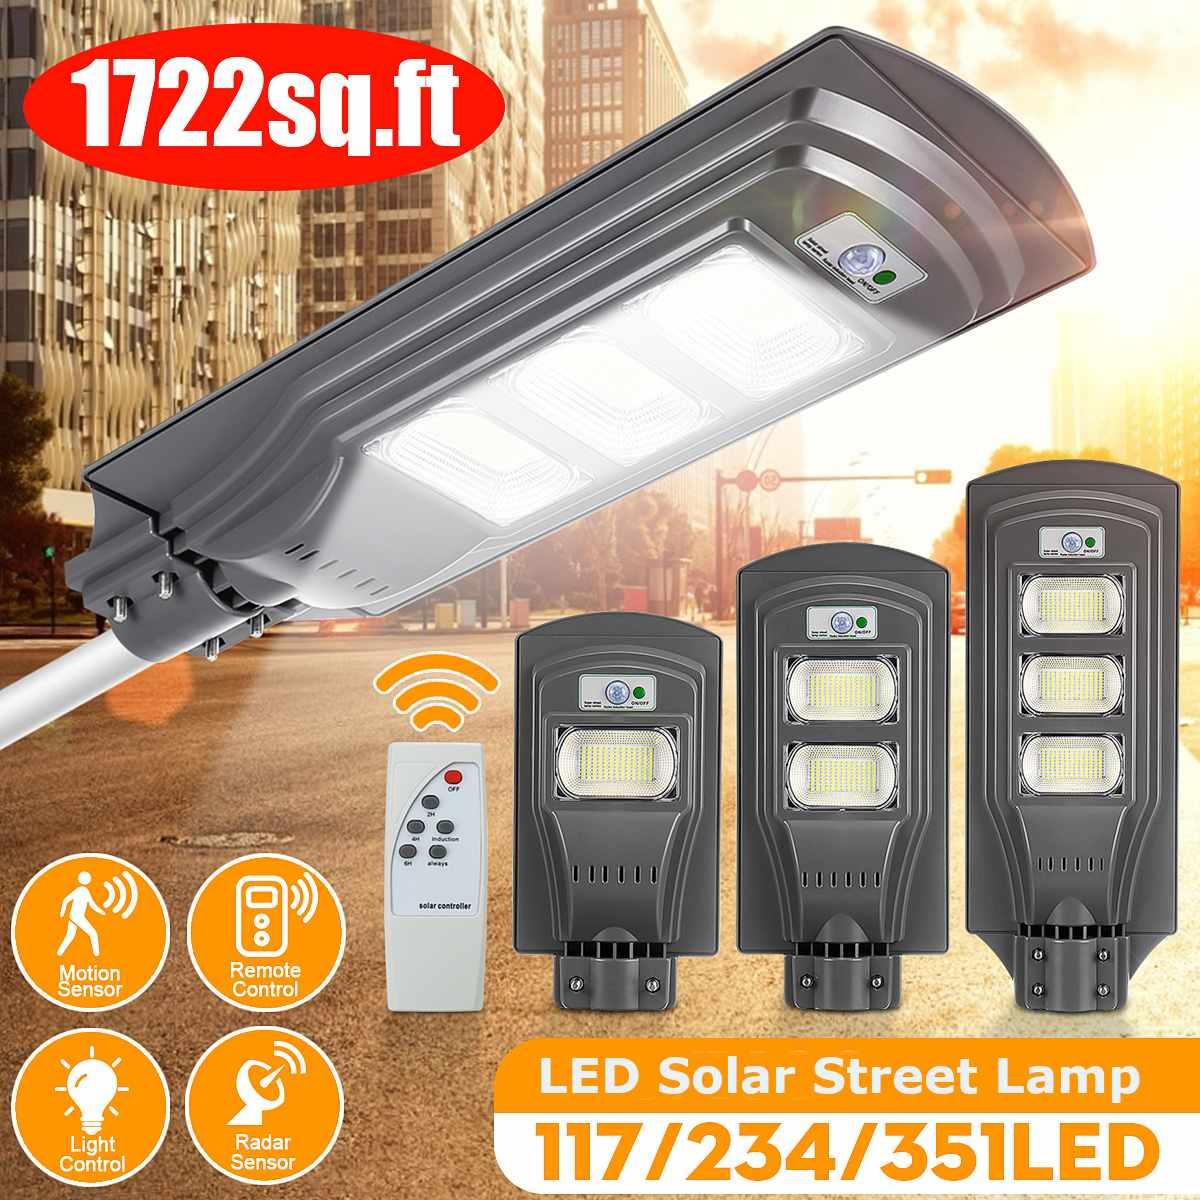 LED Solar Street Light with Remote Controller 120W 240W 360W Outdoor Lighting IP65 Waterproof PIR Motion Sensor Garden Path Lmap